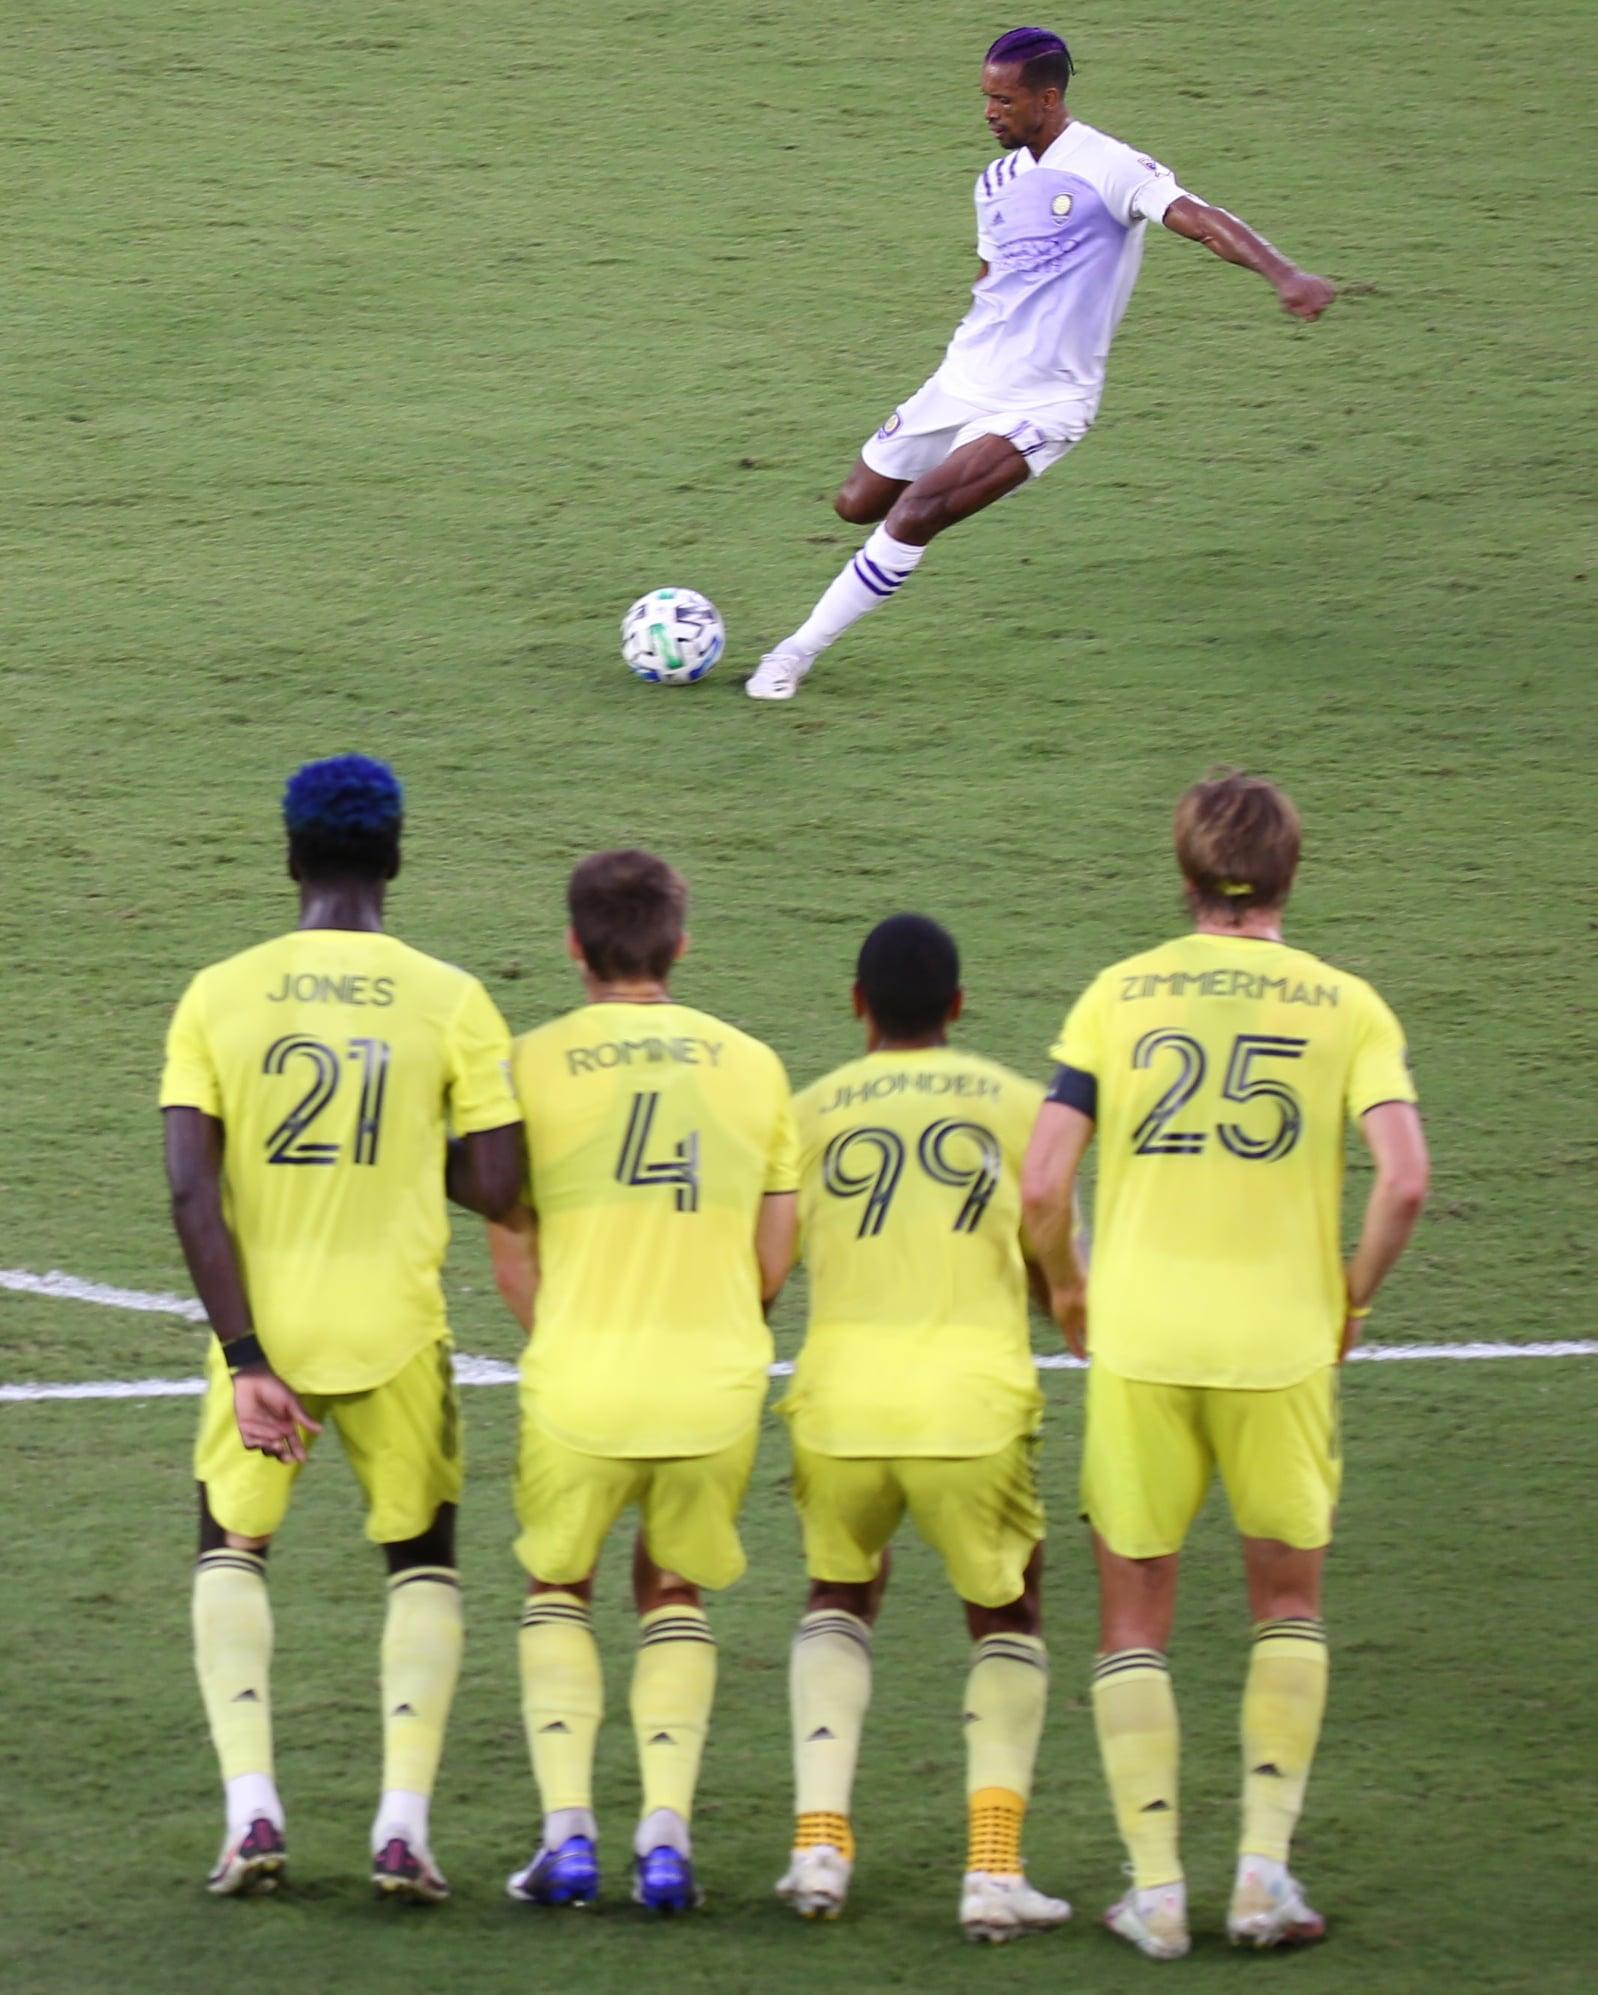 Orlando City SC midfielder Luis Nani makes a goal-winning free kick in the second half against Nashville SC Sunday night at Exploria Stadium. Photo: Mellissa Thomas/Florida National News.